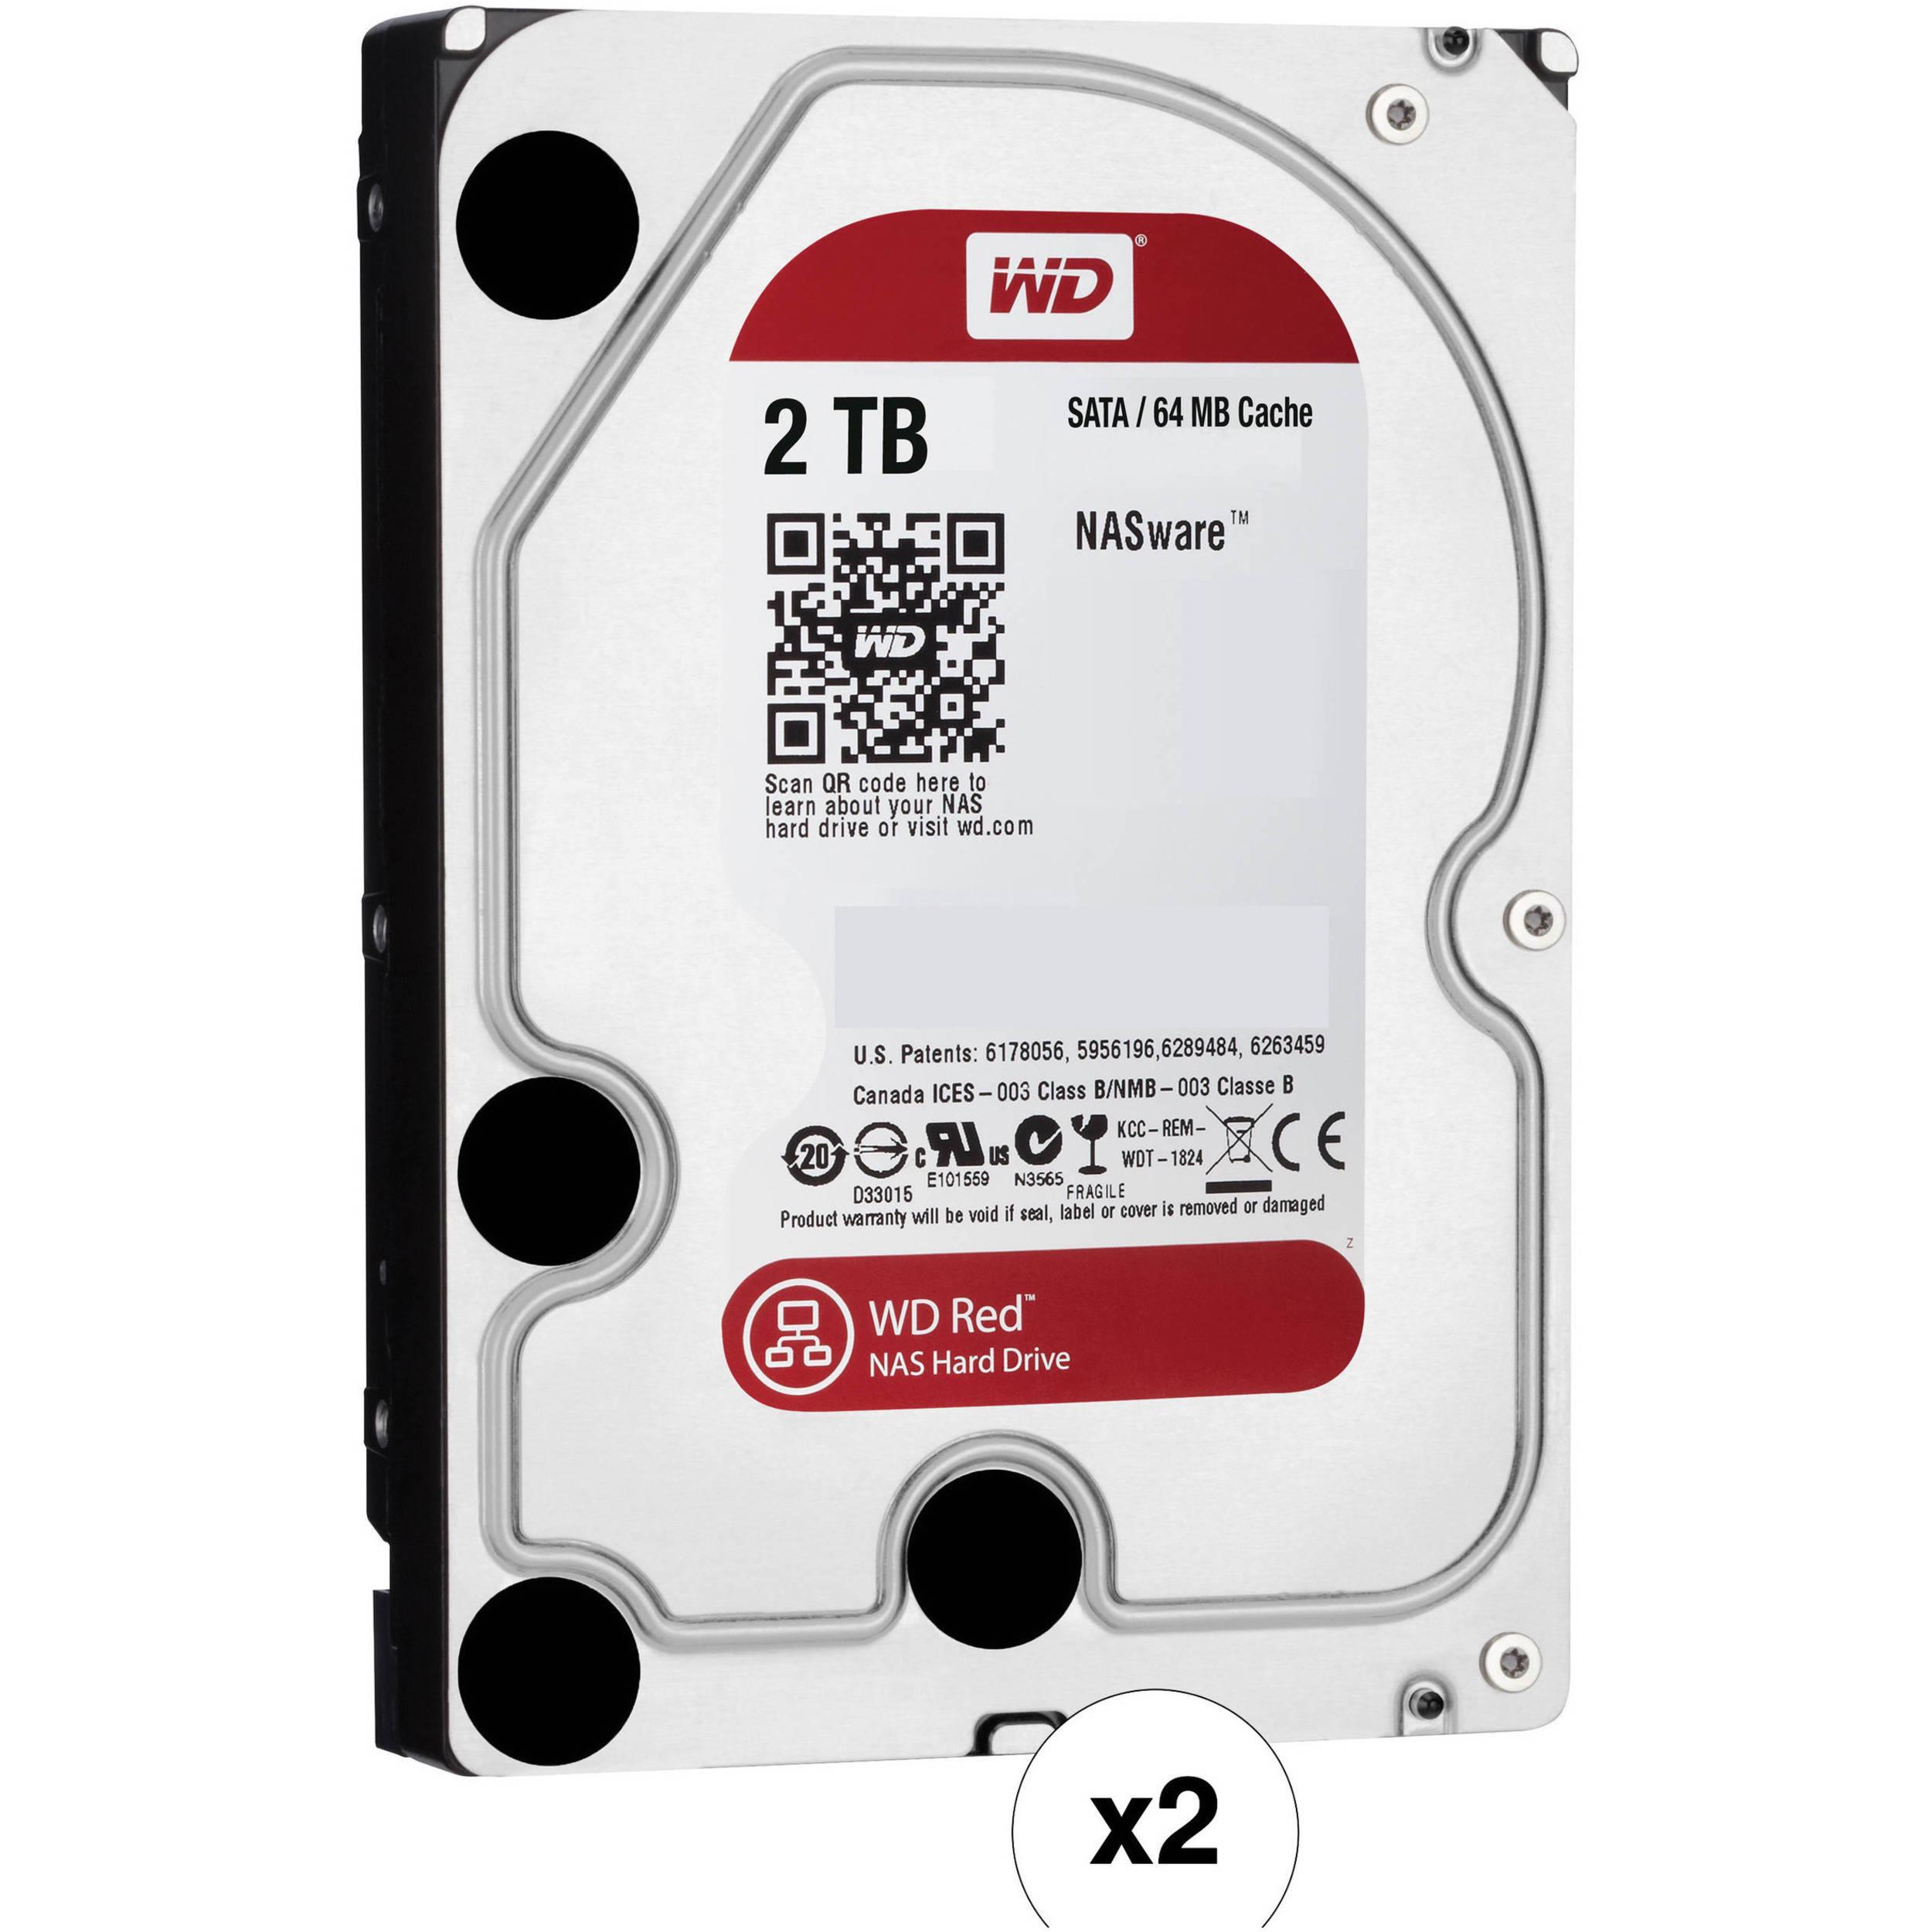 https://www bhphotovideo com/c/product/1175111-REG